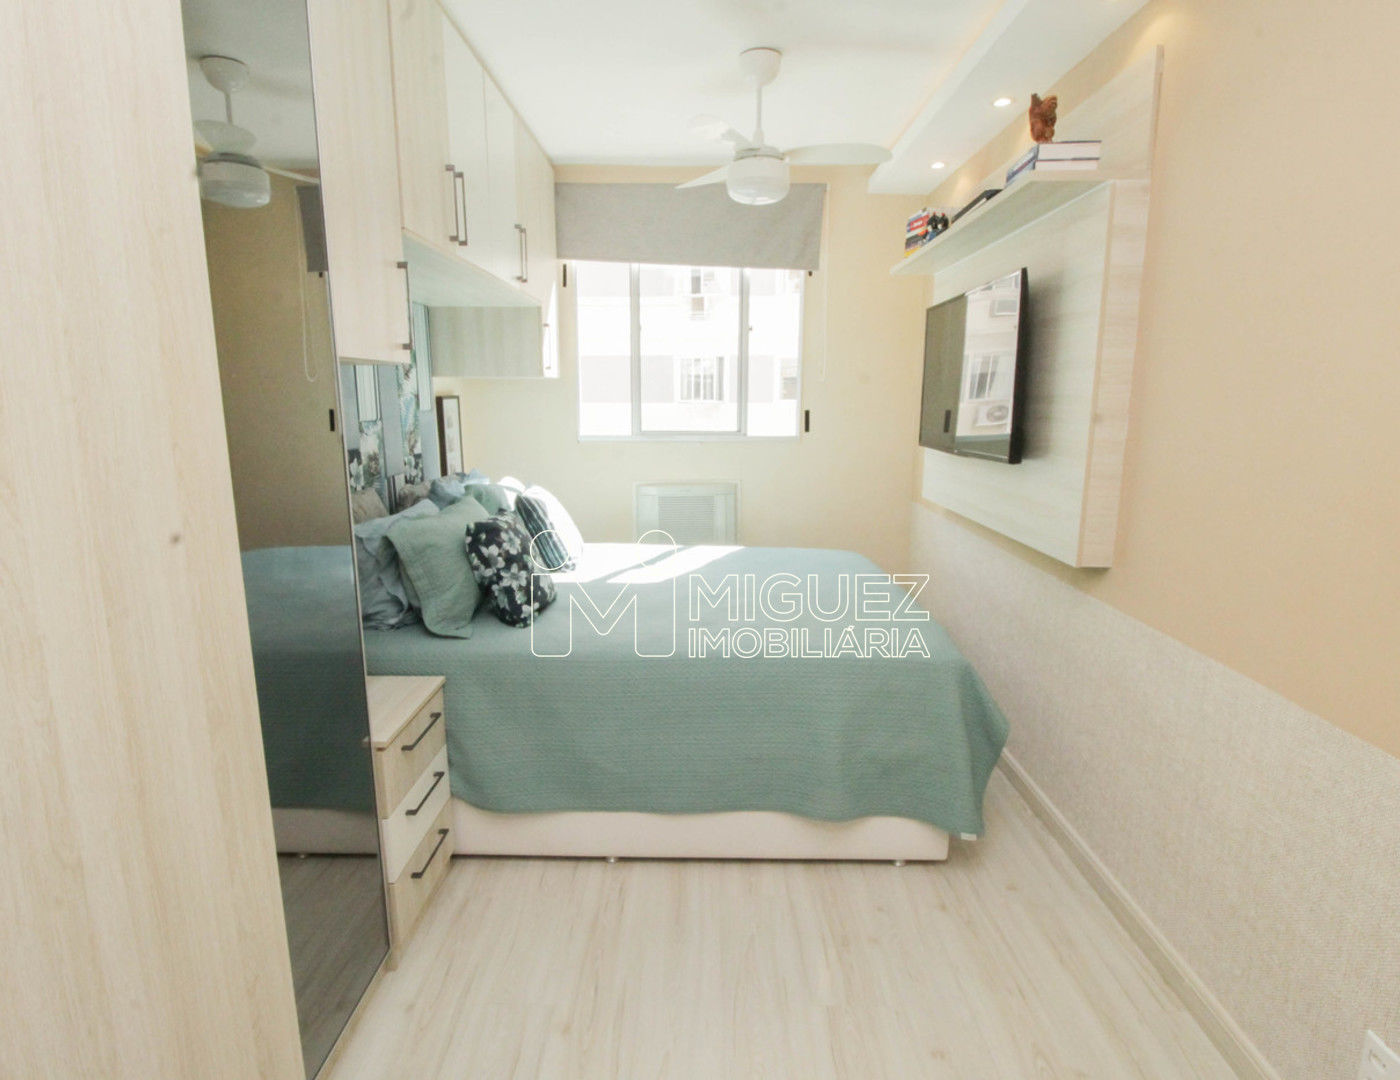 Apartamento, aluguel, Rua Aristides Lobo - Rio Comprido , Rio de janeiro